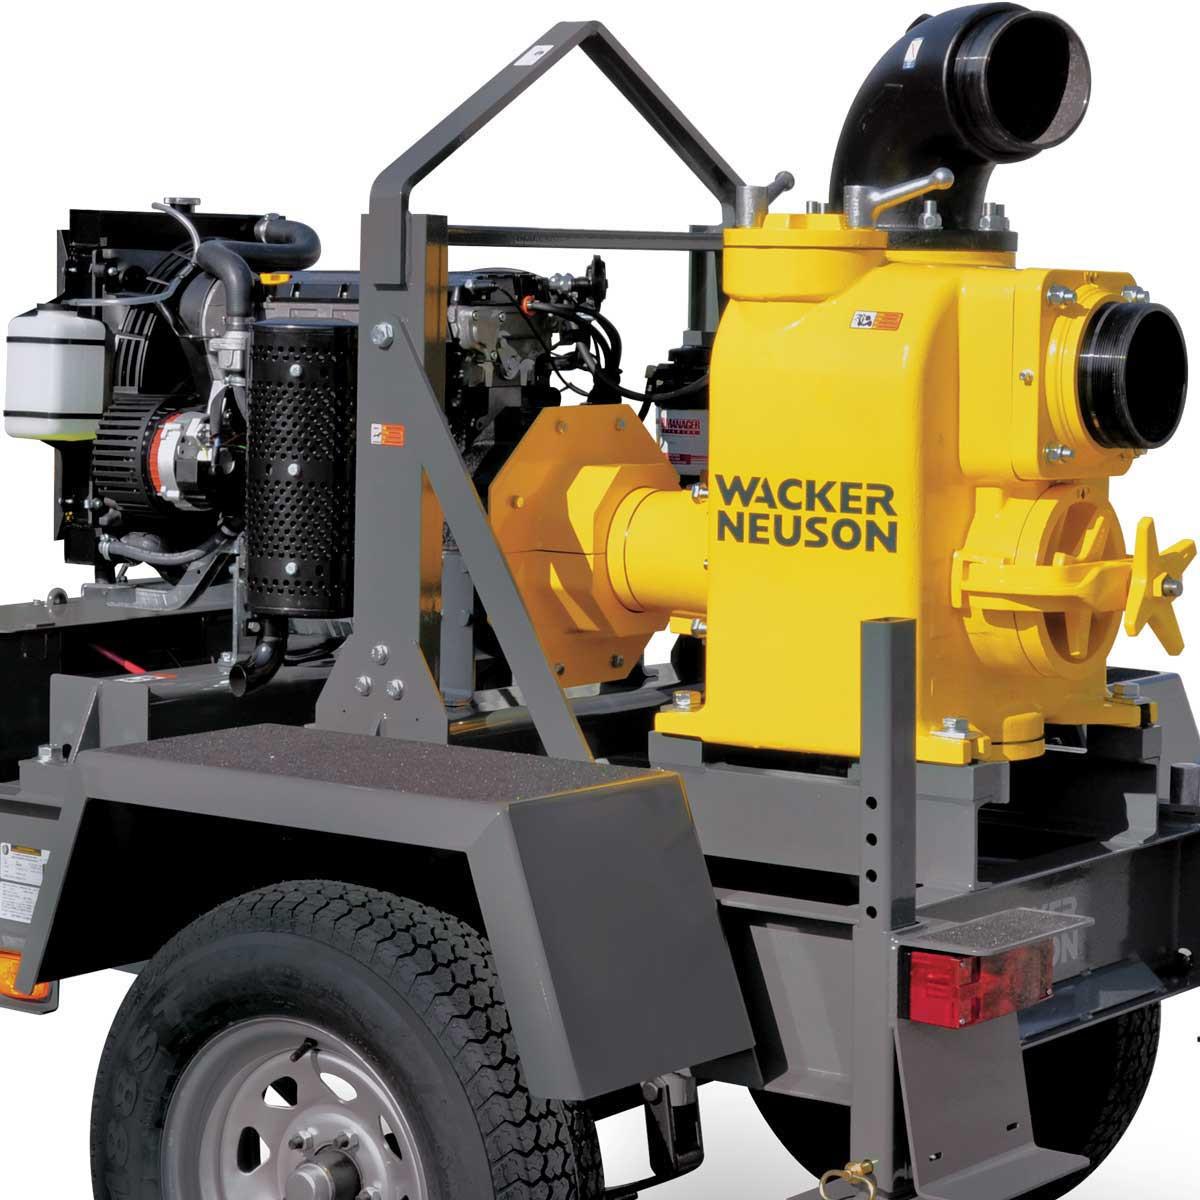 PTS 6LT 6 inch Centrifugal Trash Pump Wacker Neuson